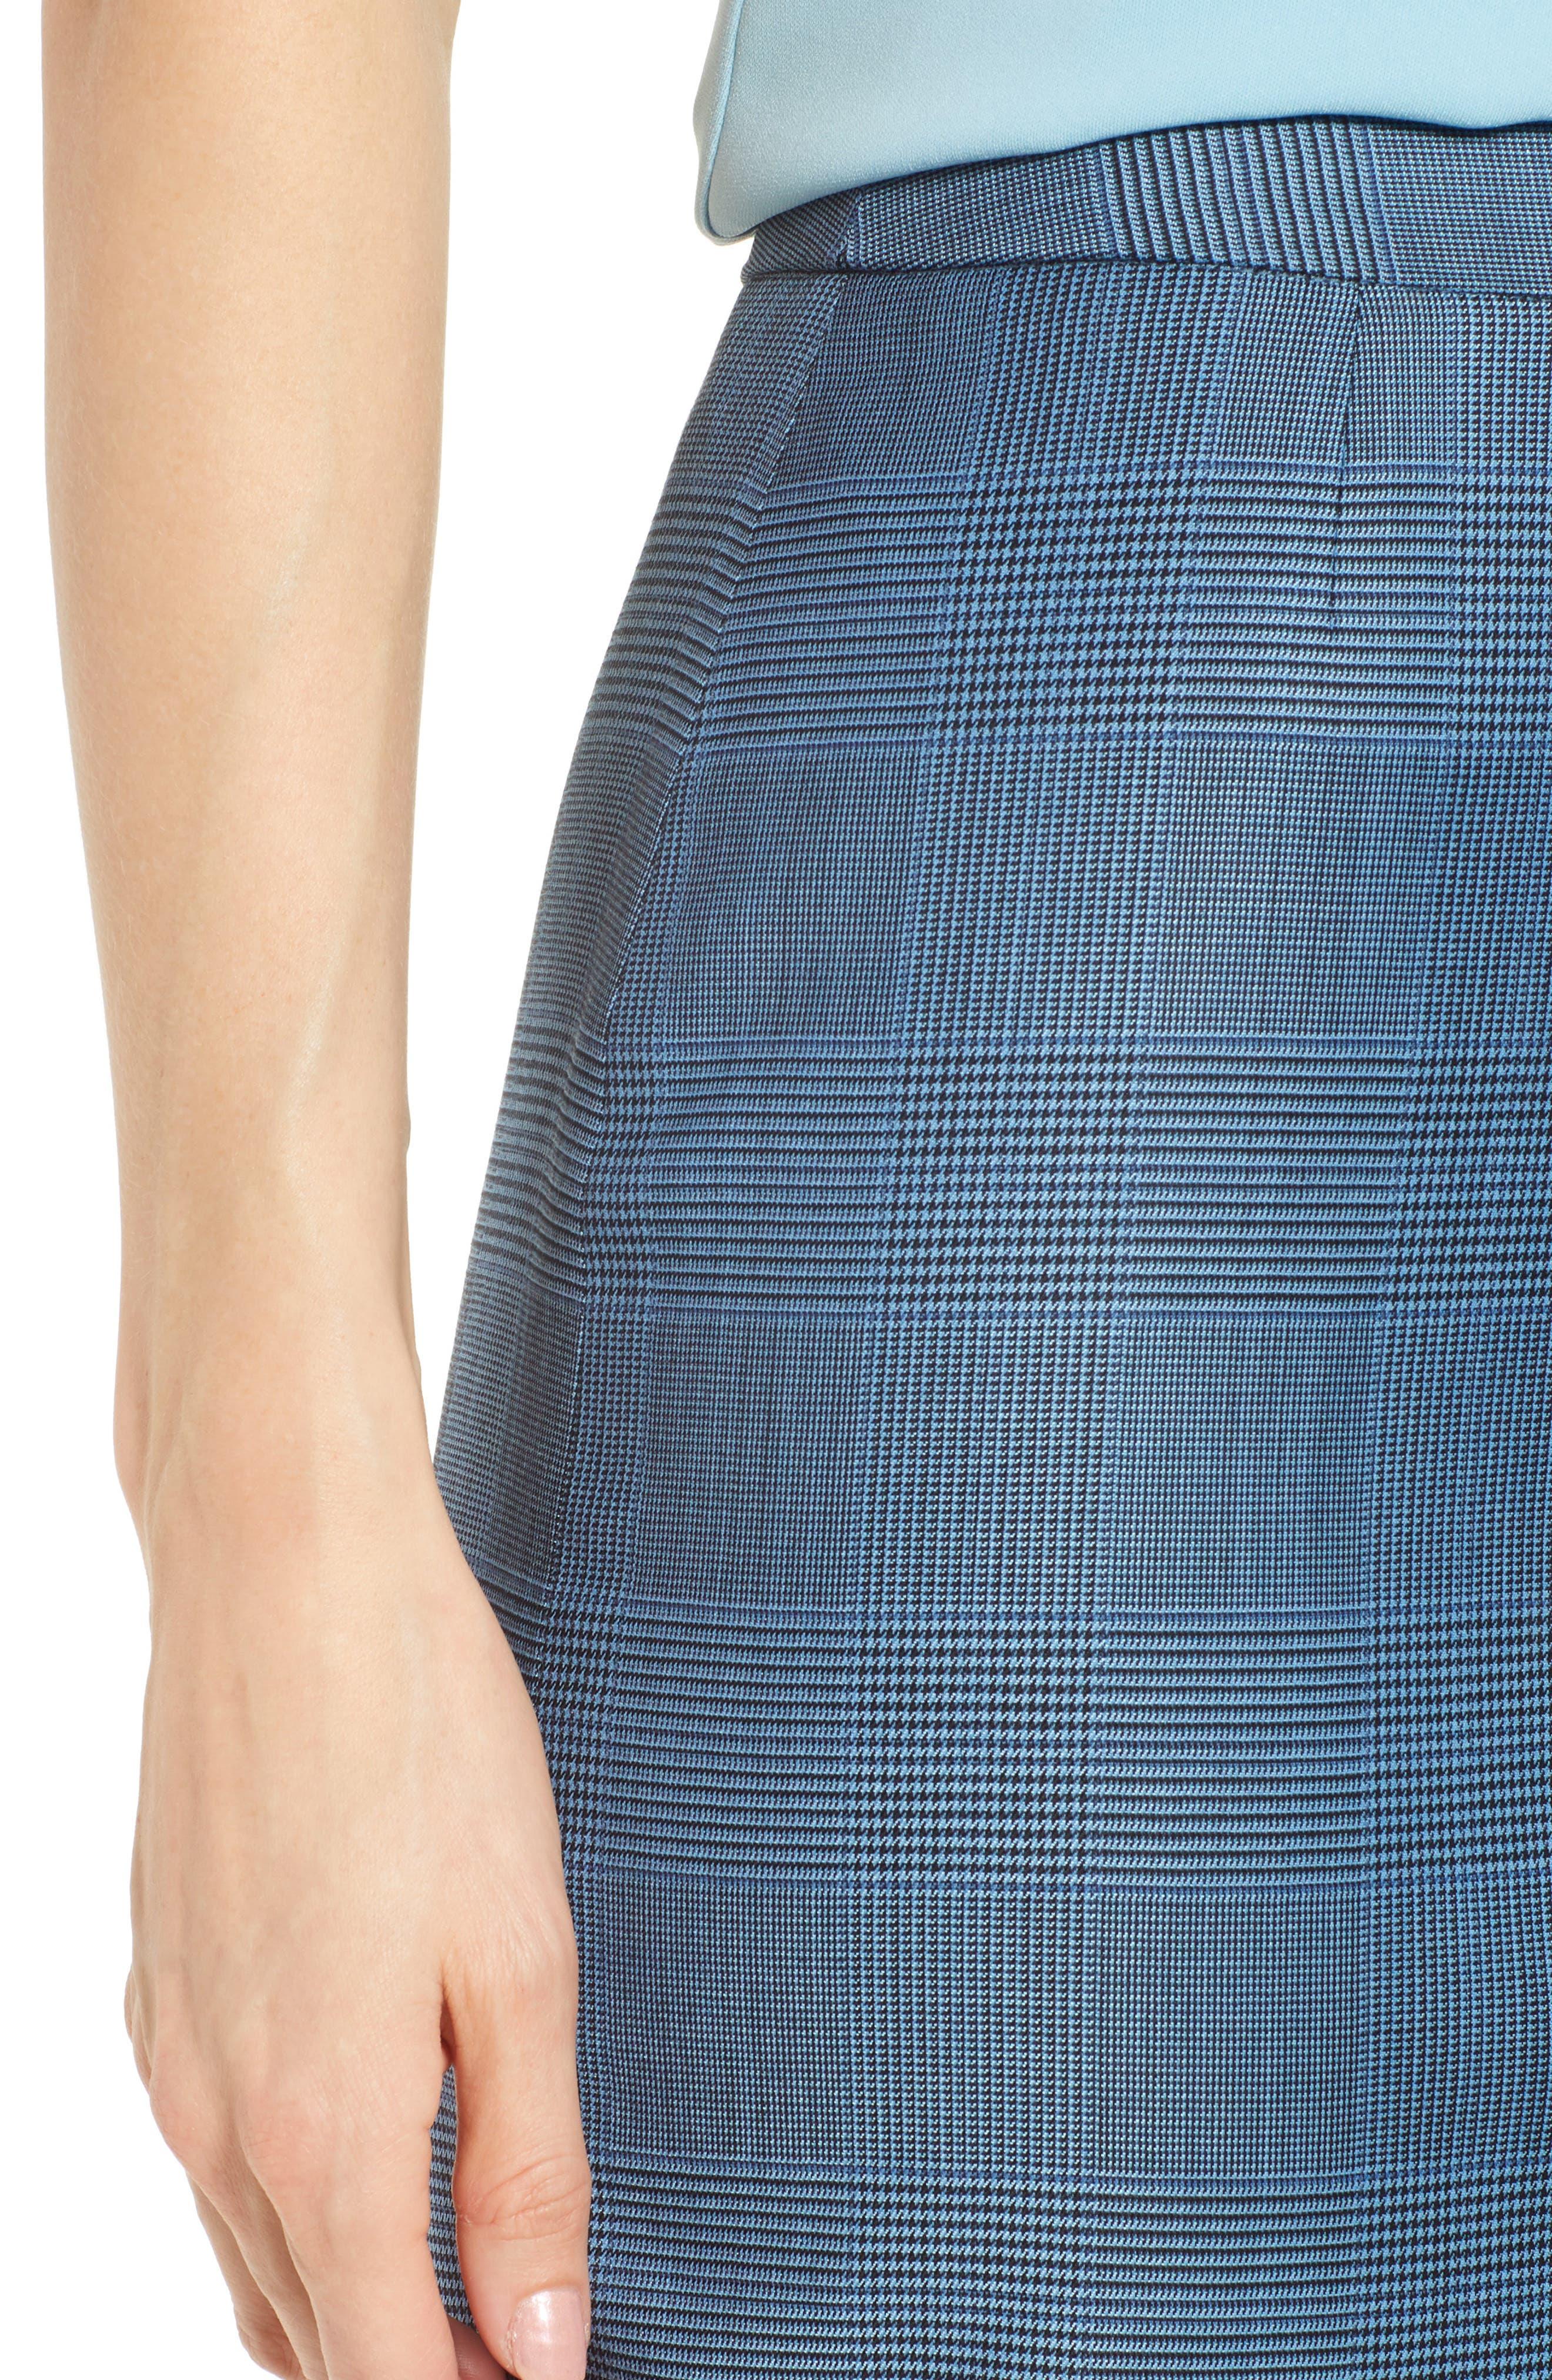 Vimena Glencheck Stretch Wool Pencil Skirt,                             Alternate thumbnail 4, color,                             Sailor Blue Fantasy